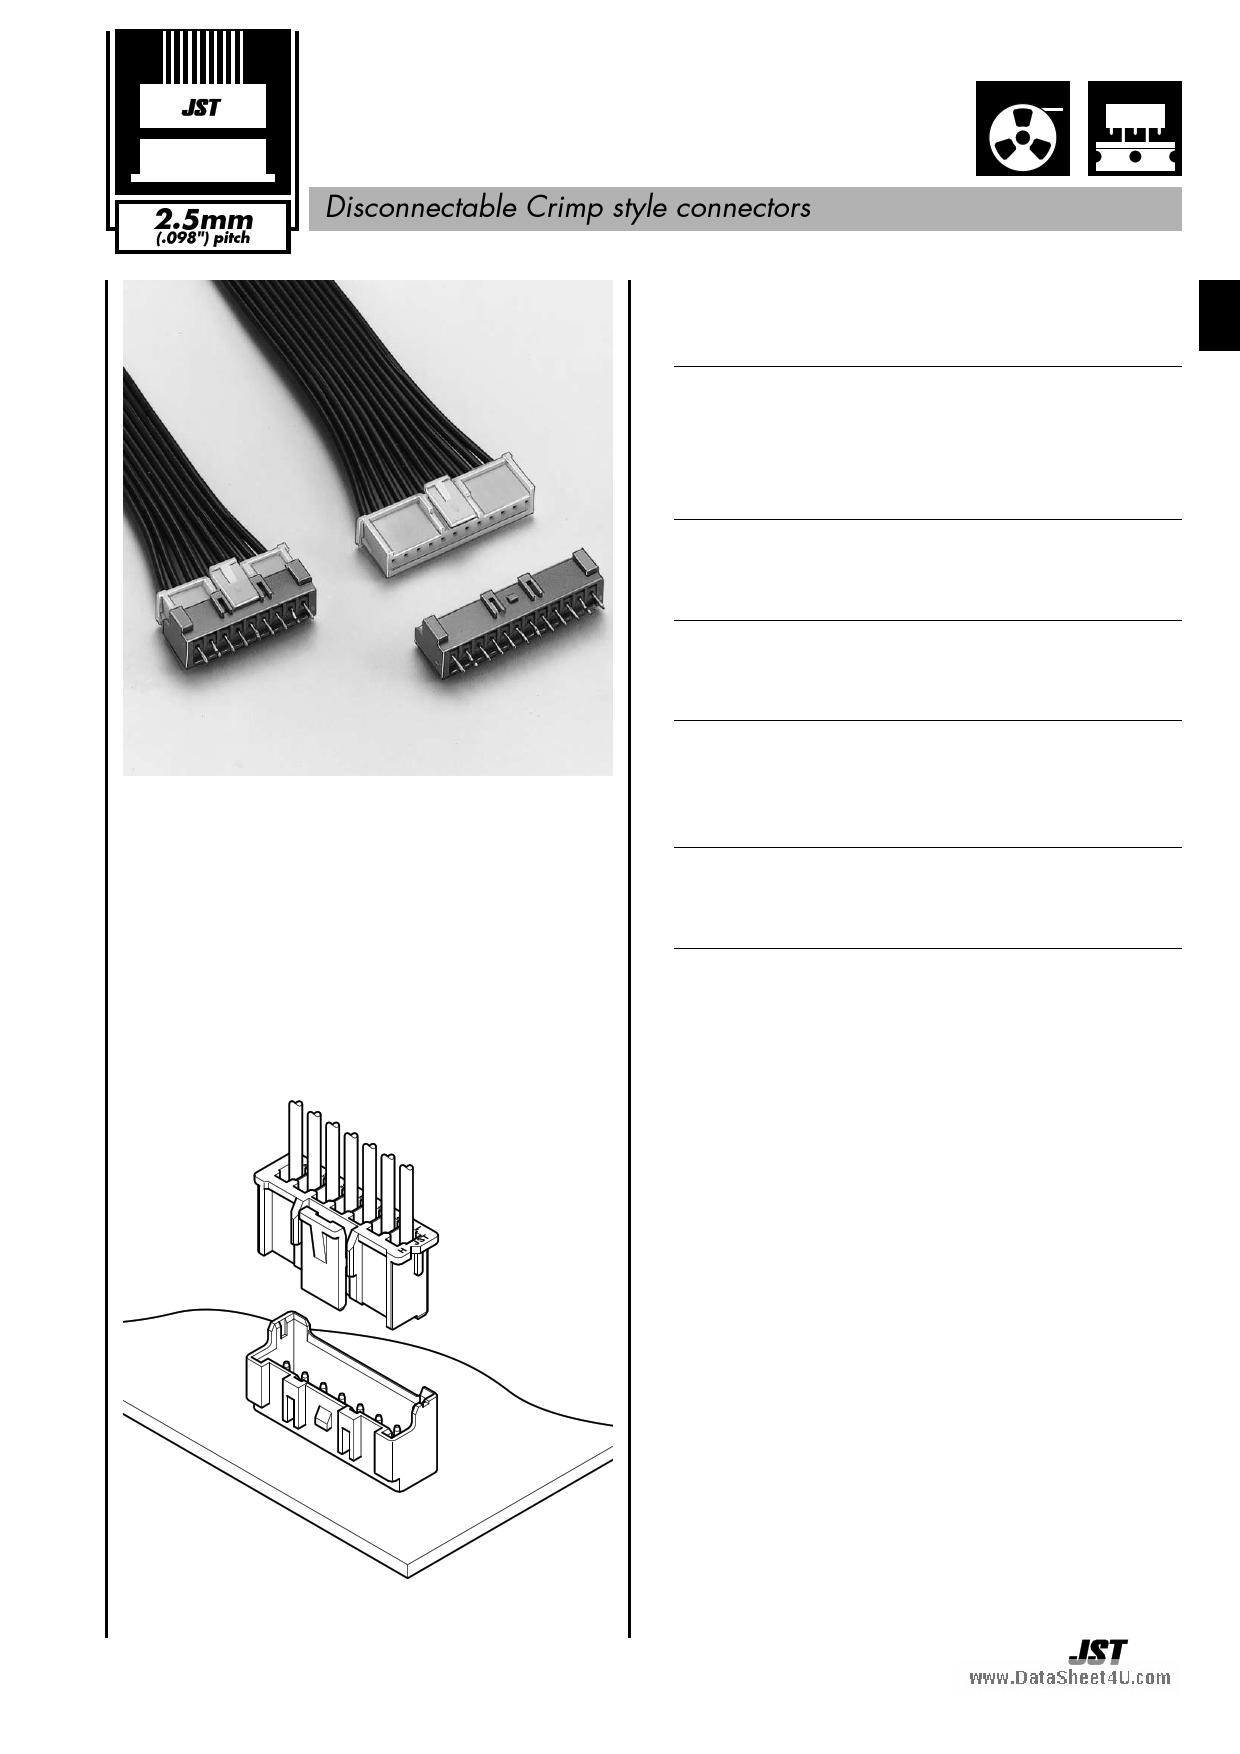 B03B-XASK-1-A datasheet